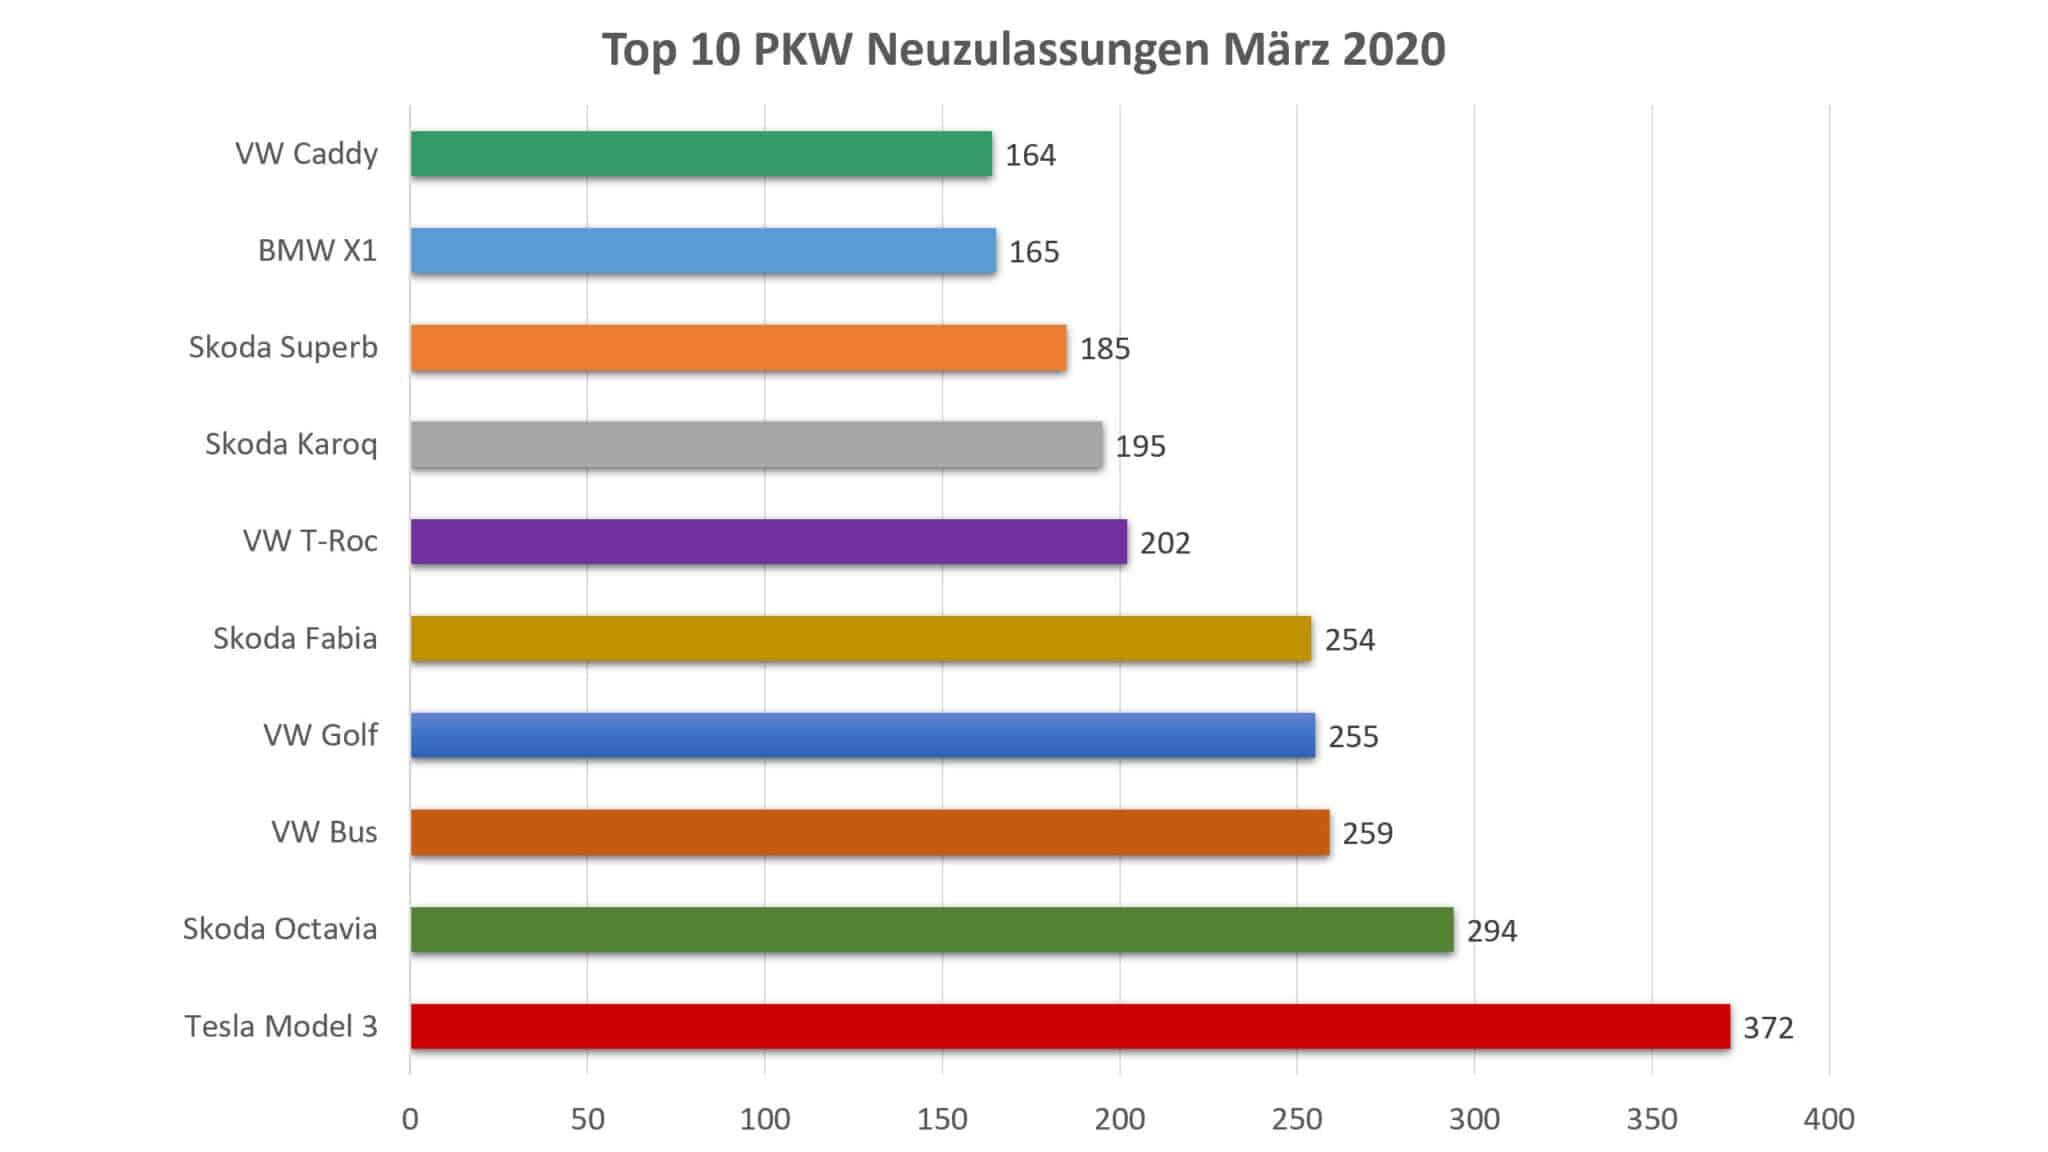 PKW Neuzulassungsstatistik im 1. Quartal 2020 | PKW Top 10 3 2020 scaled